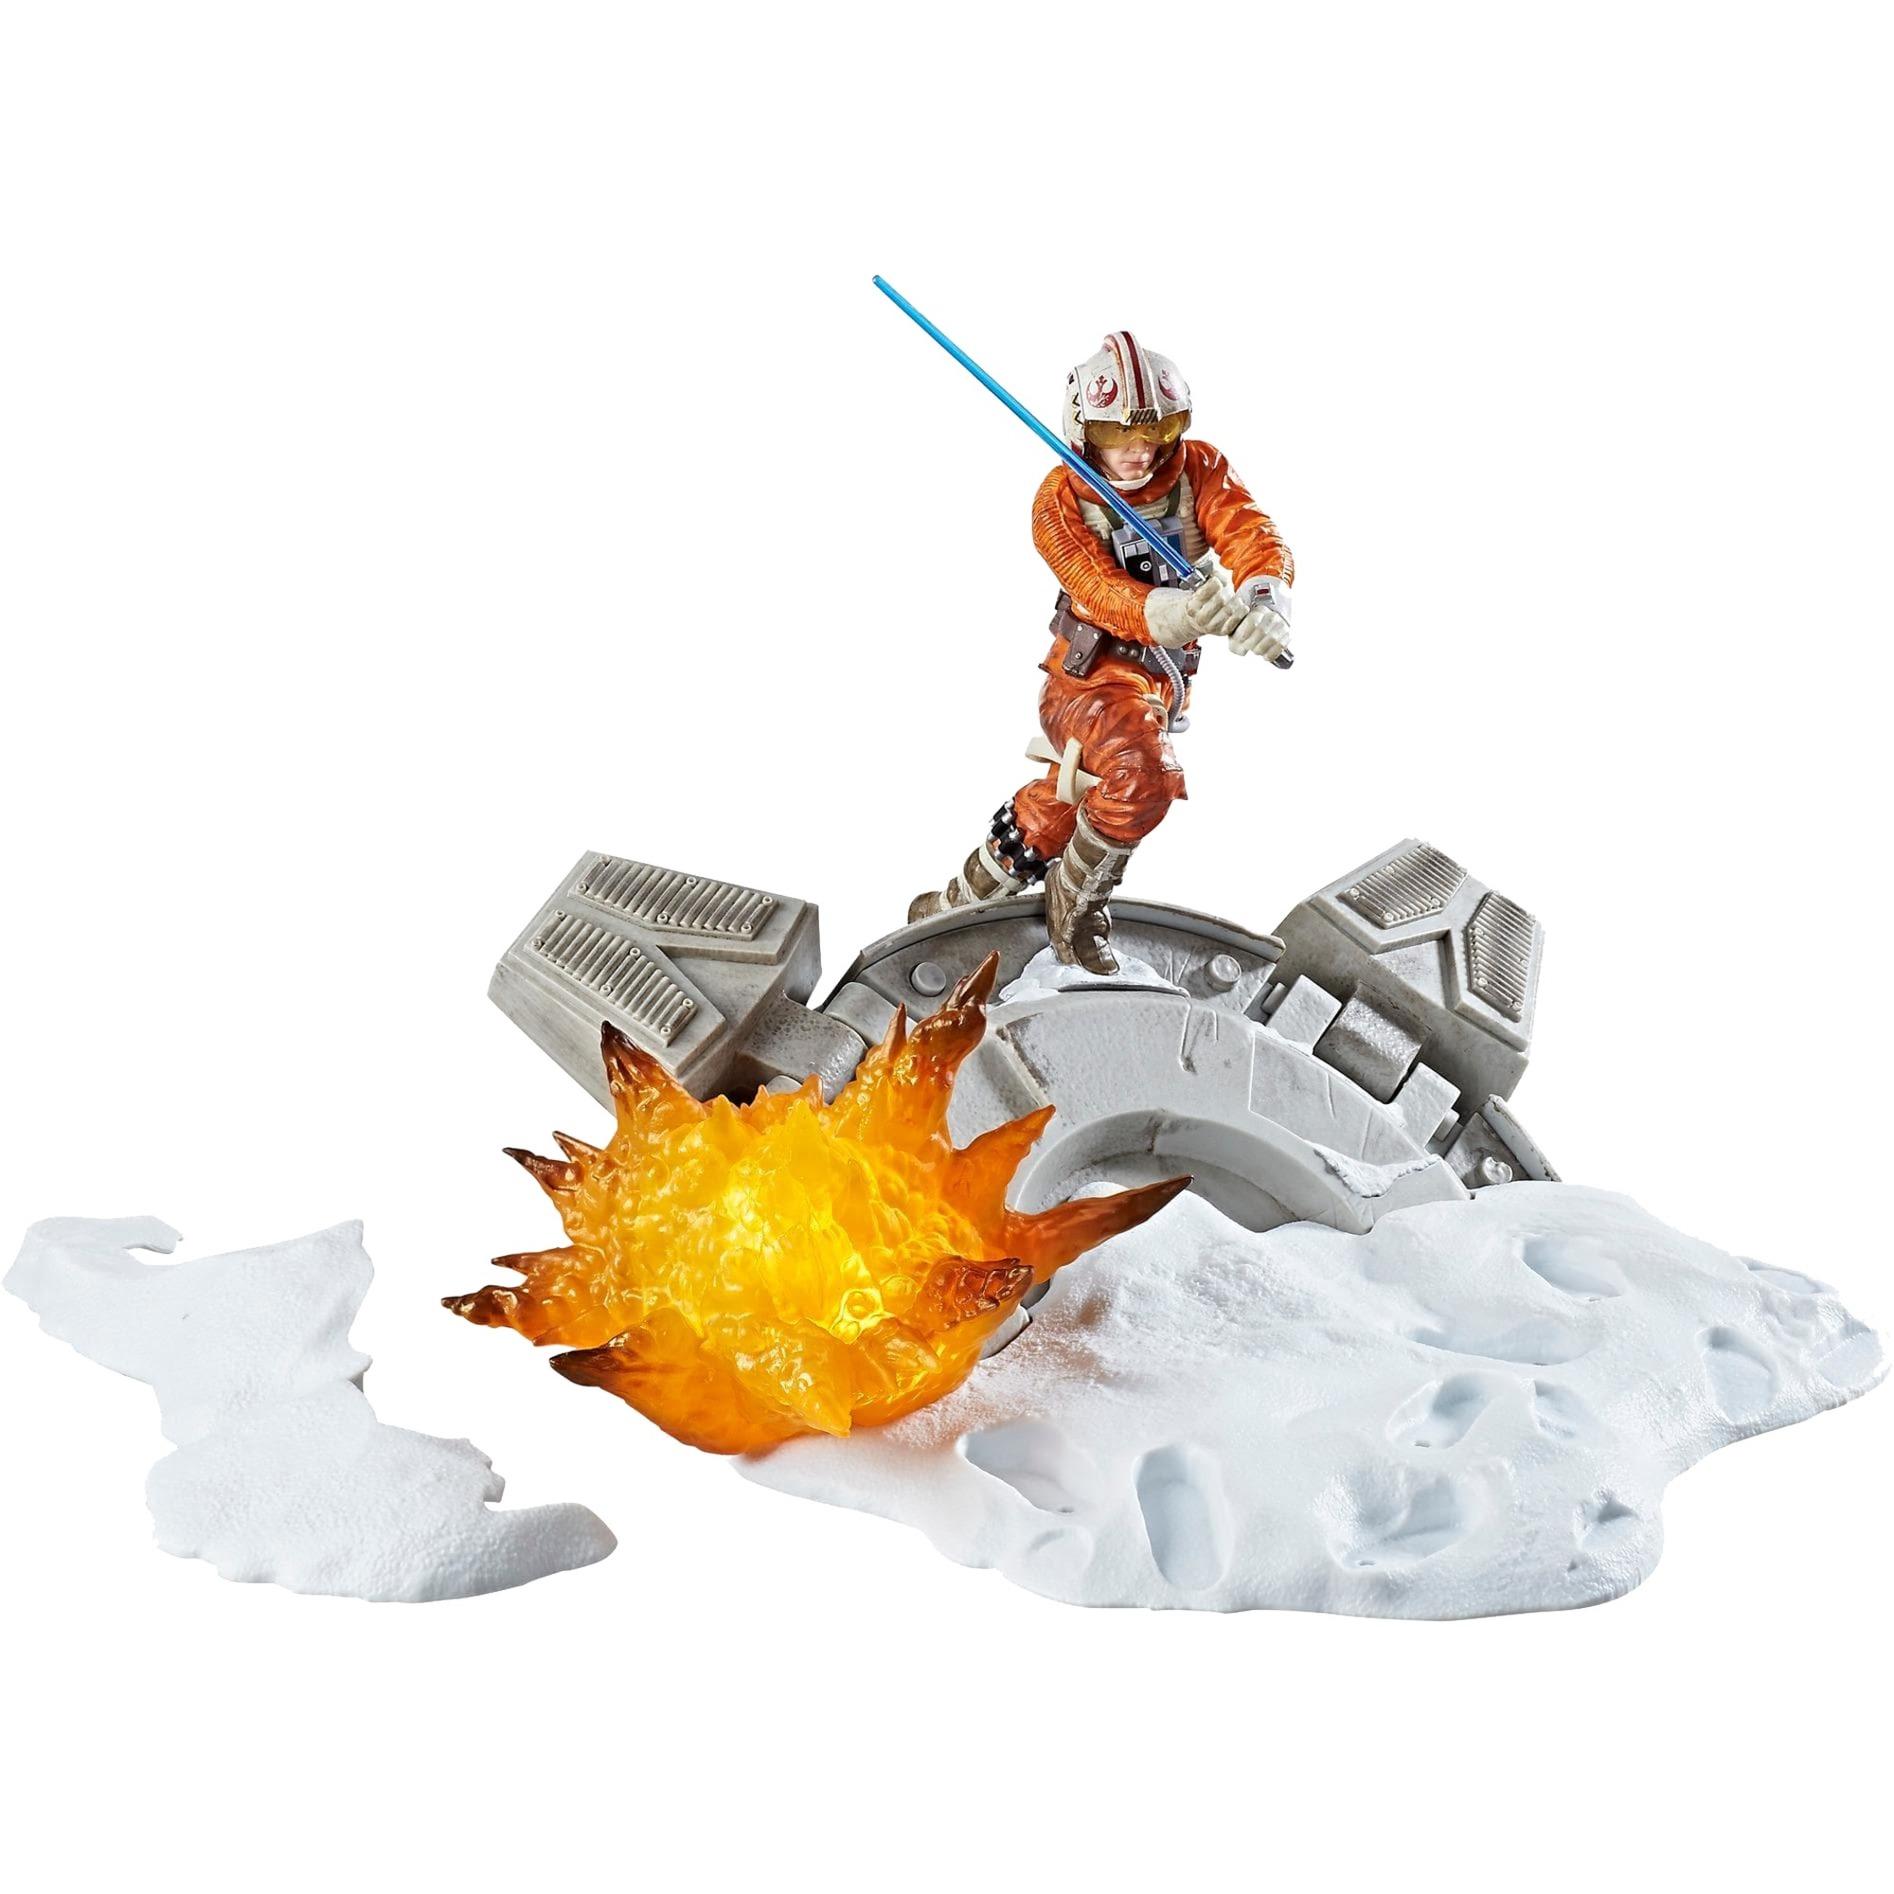 Figura Luke Skywalker con base Star Wars The Black Series: Centrepiece